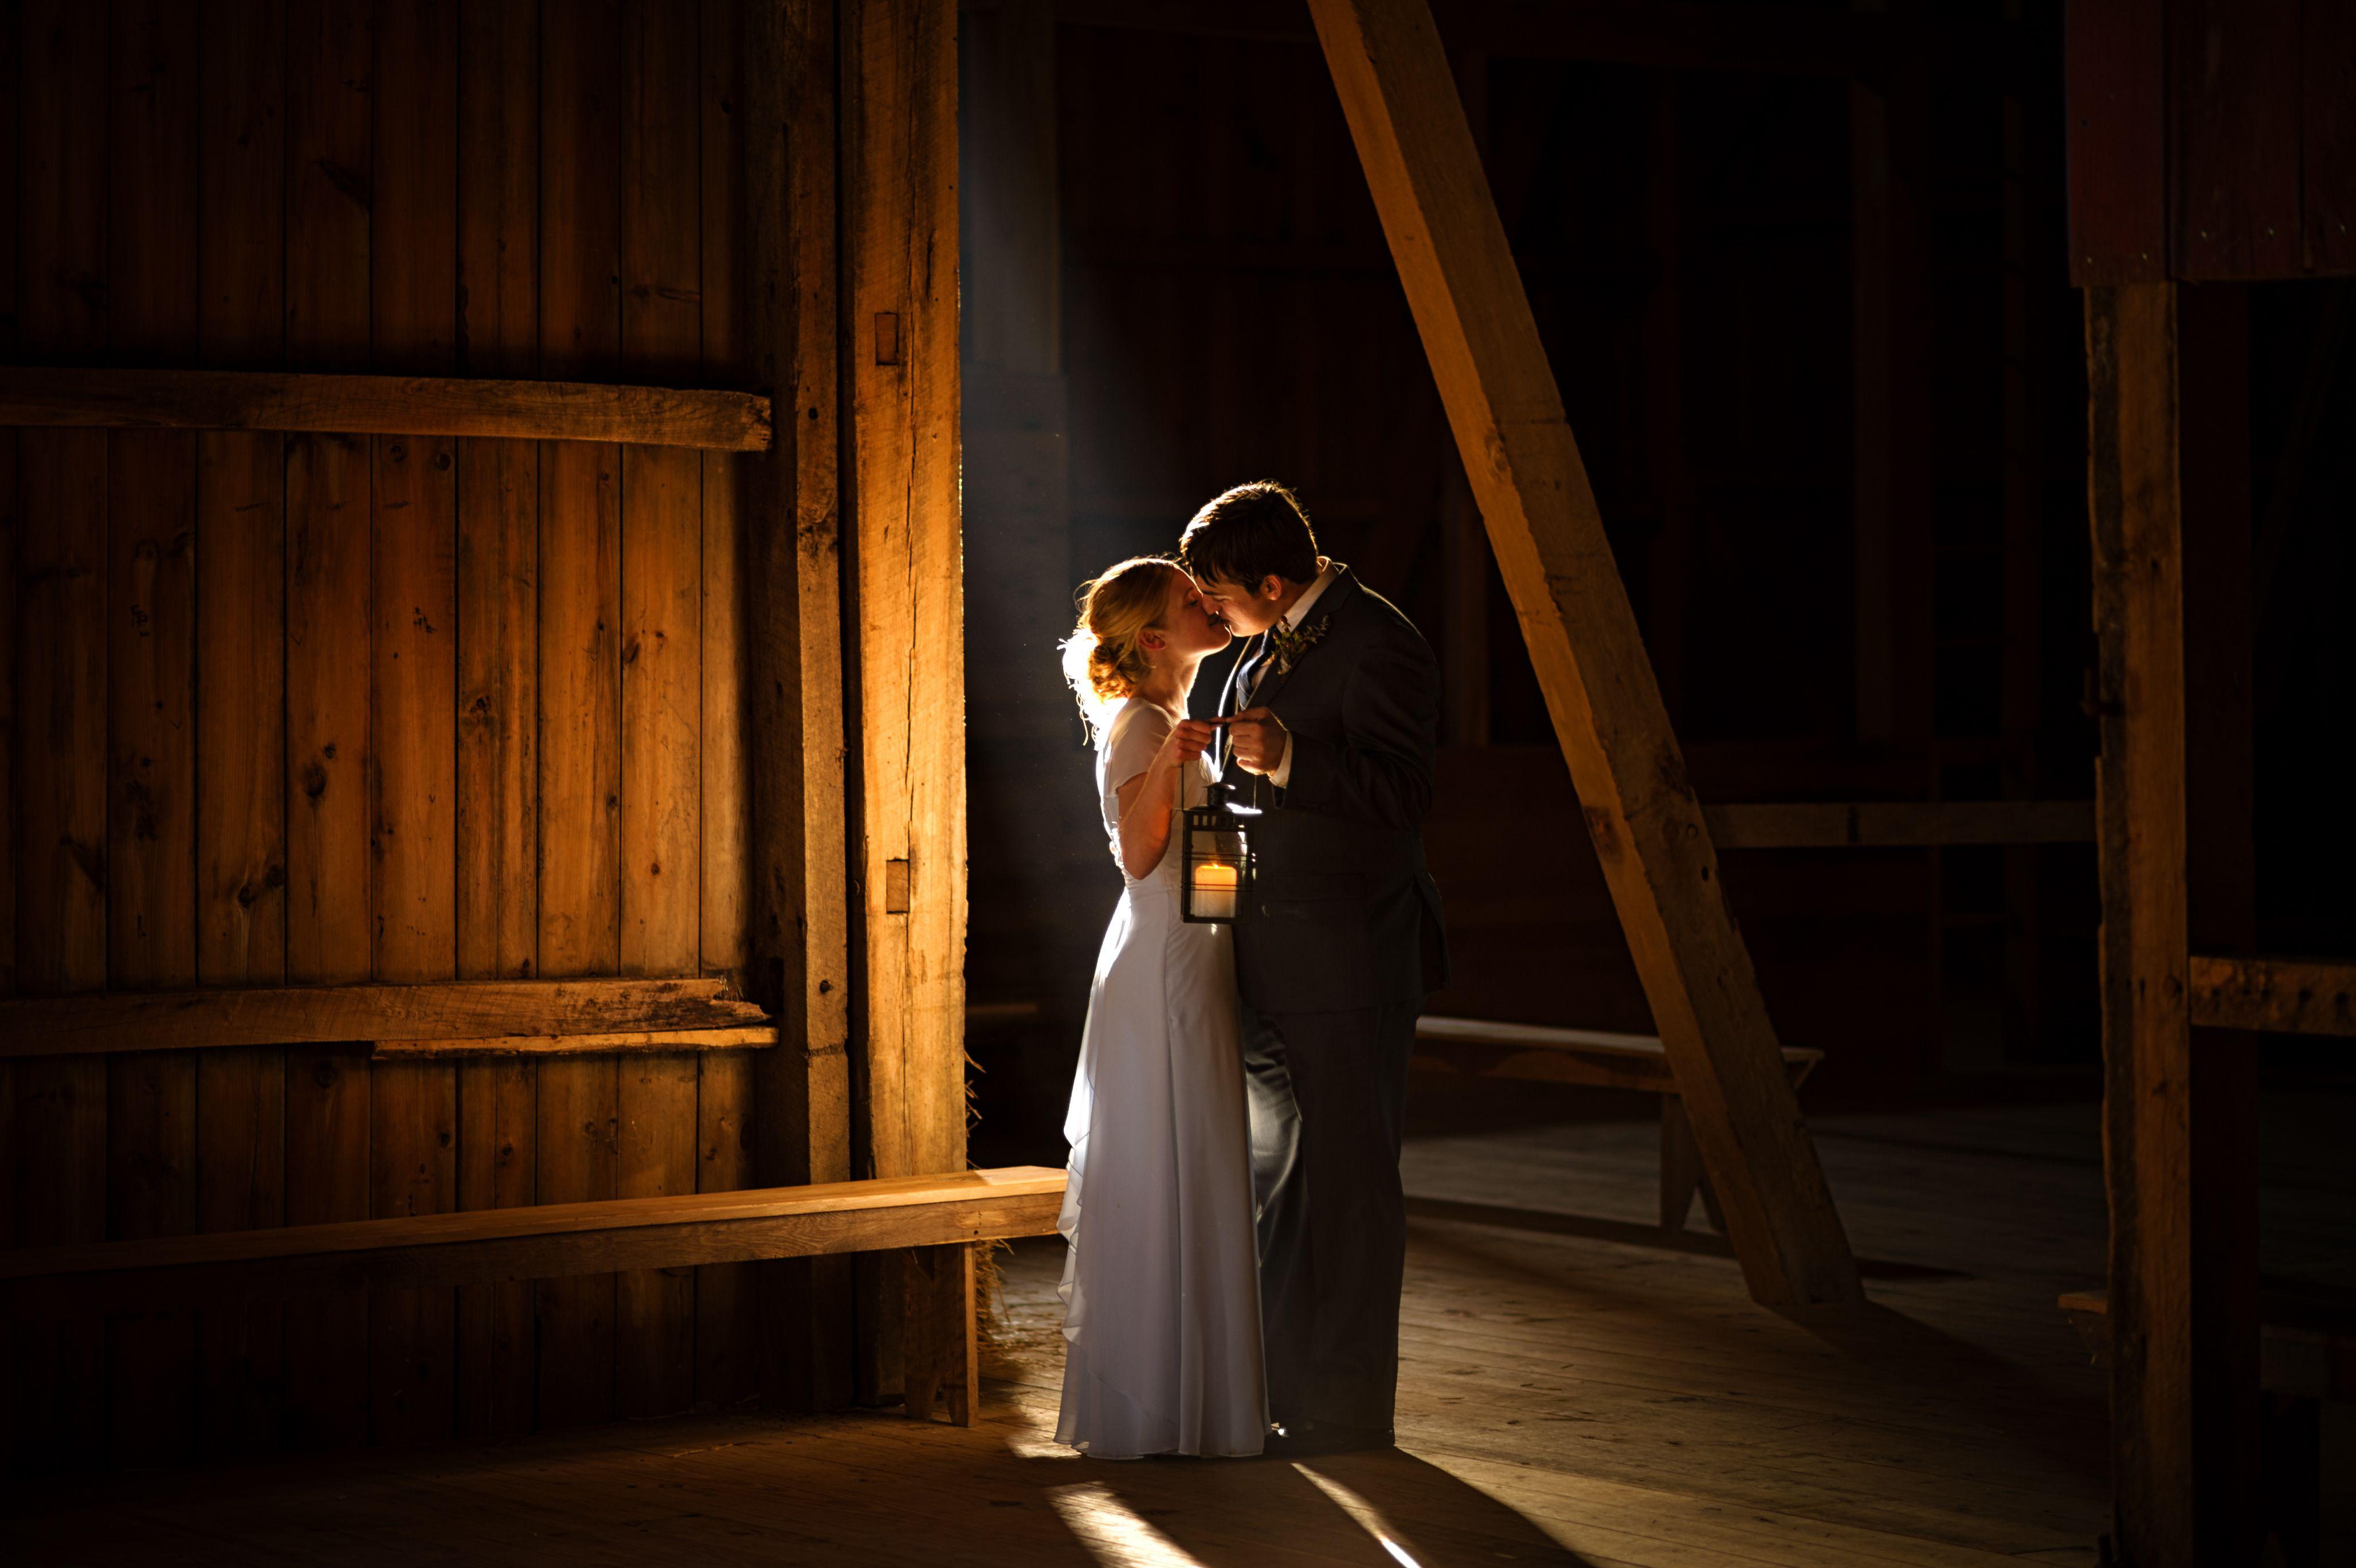 wedding picture locations akron ohio%0A Barn  wedding  bride and groom  portraits  holding a lantern  Barn Wedding